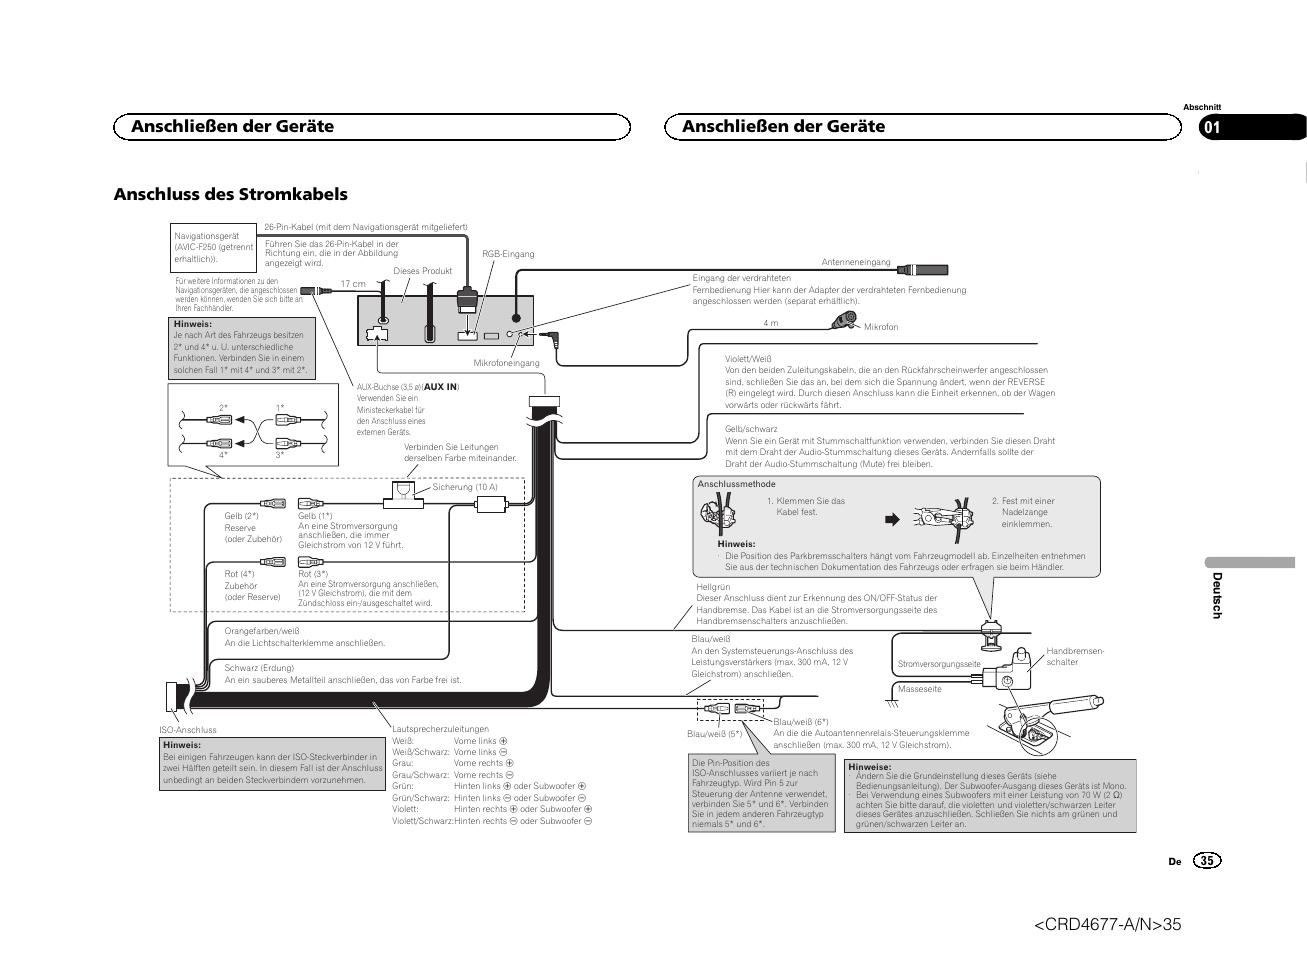 Anschluss des stromkabels, Anschließen der geräte